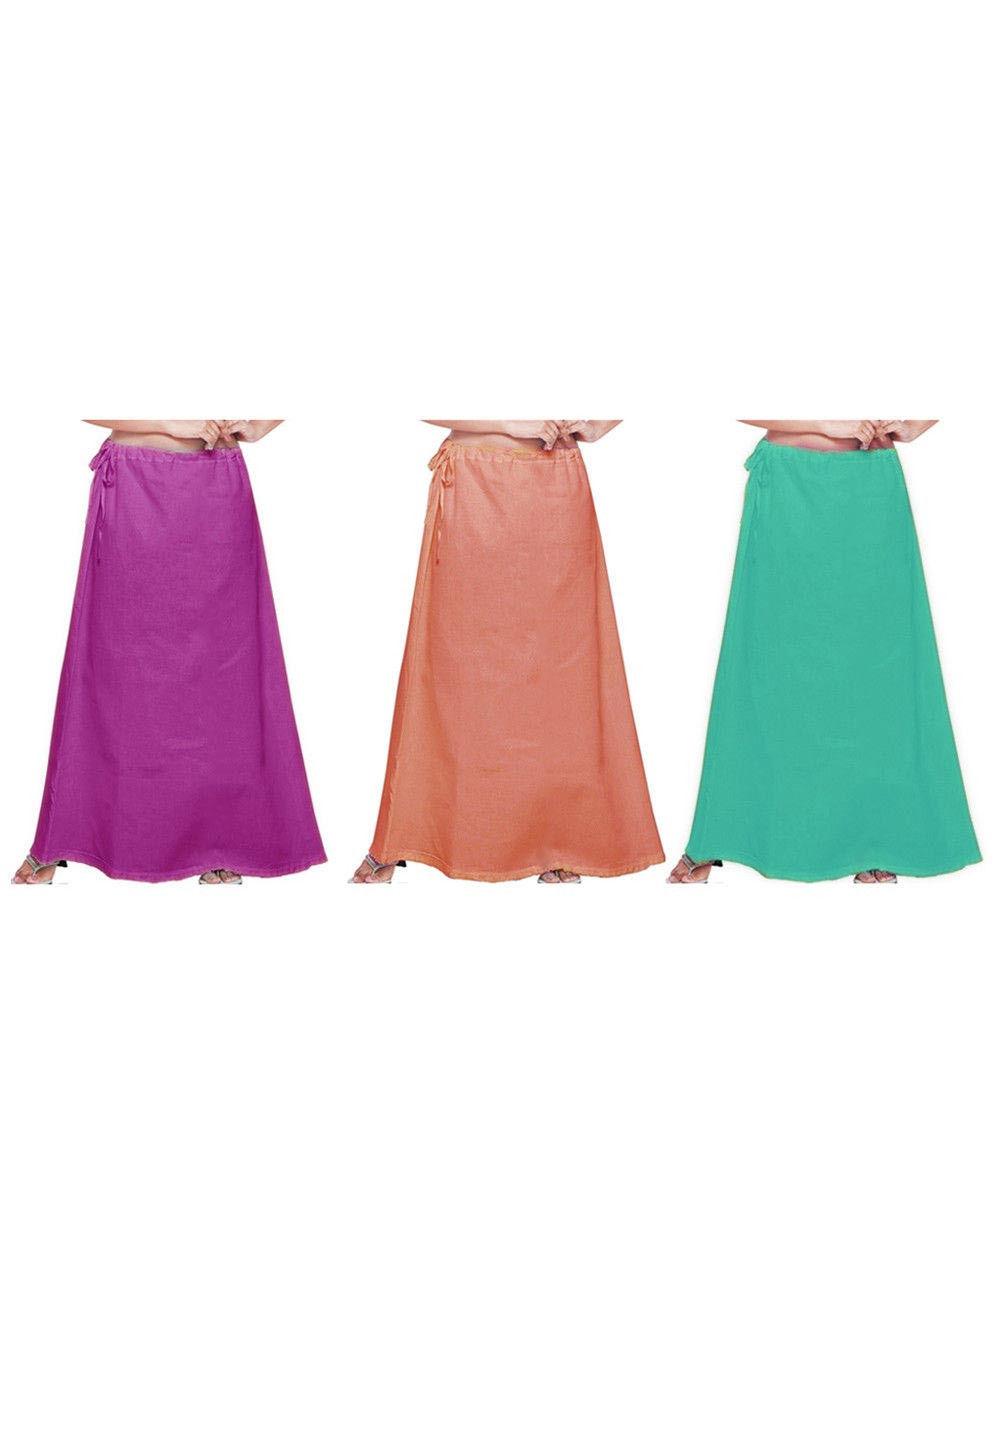 Combo Set Cotton Petticoat in Magenta, Peach and Green